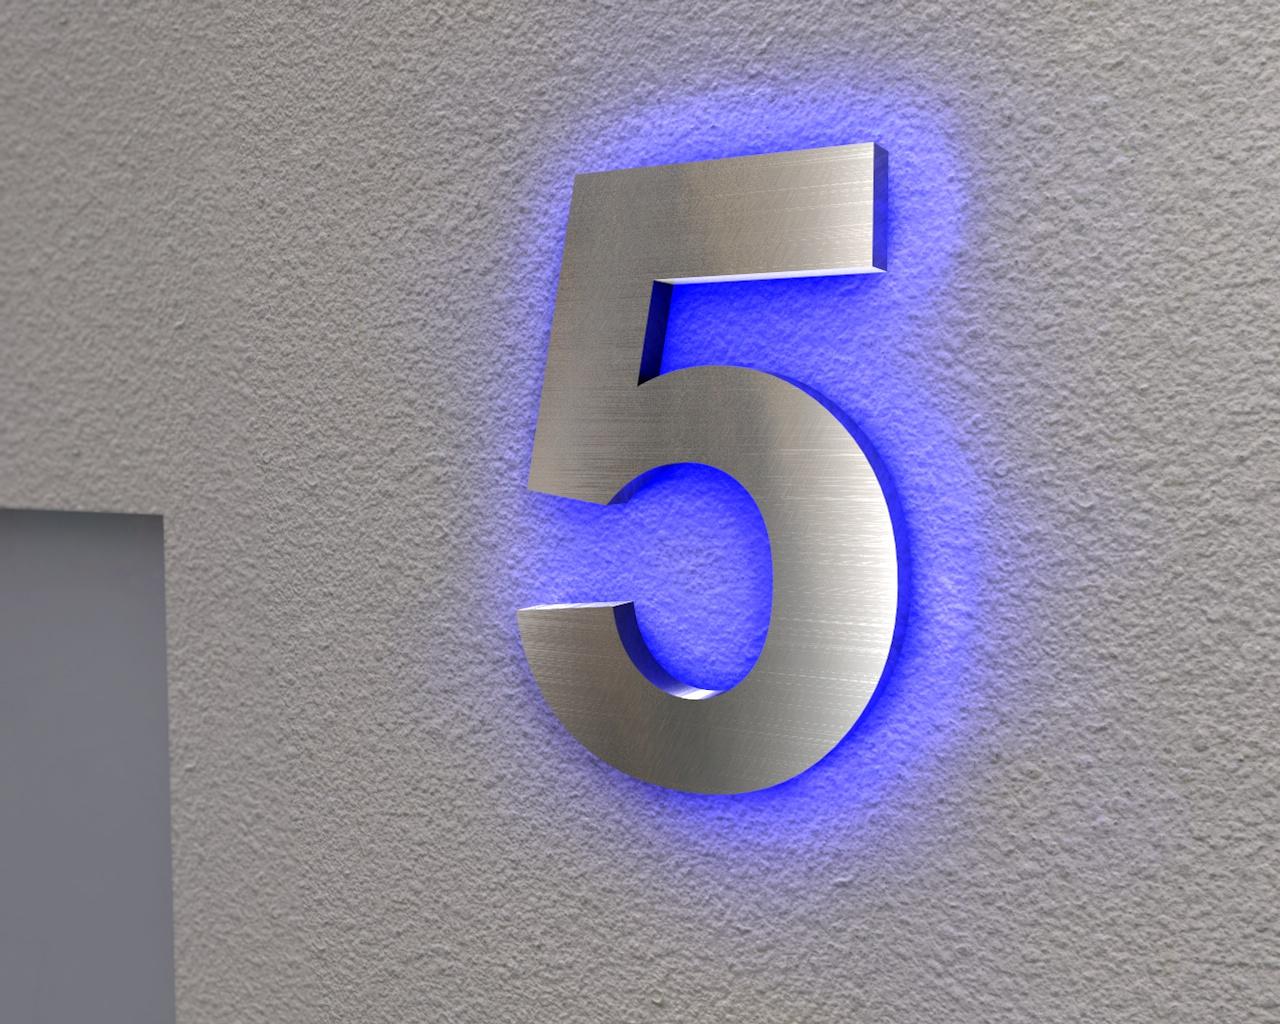 Beleuchtete Hausnummer 5 Ambilight